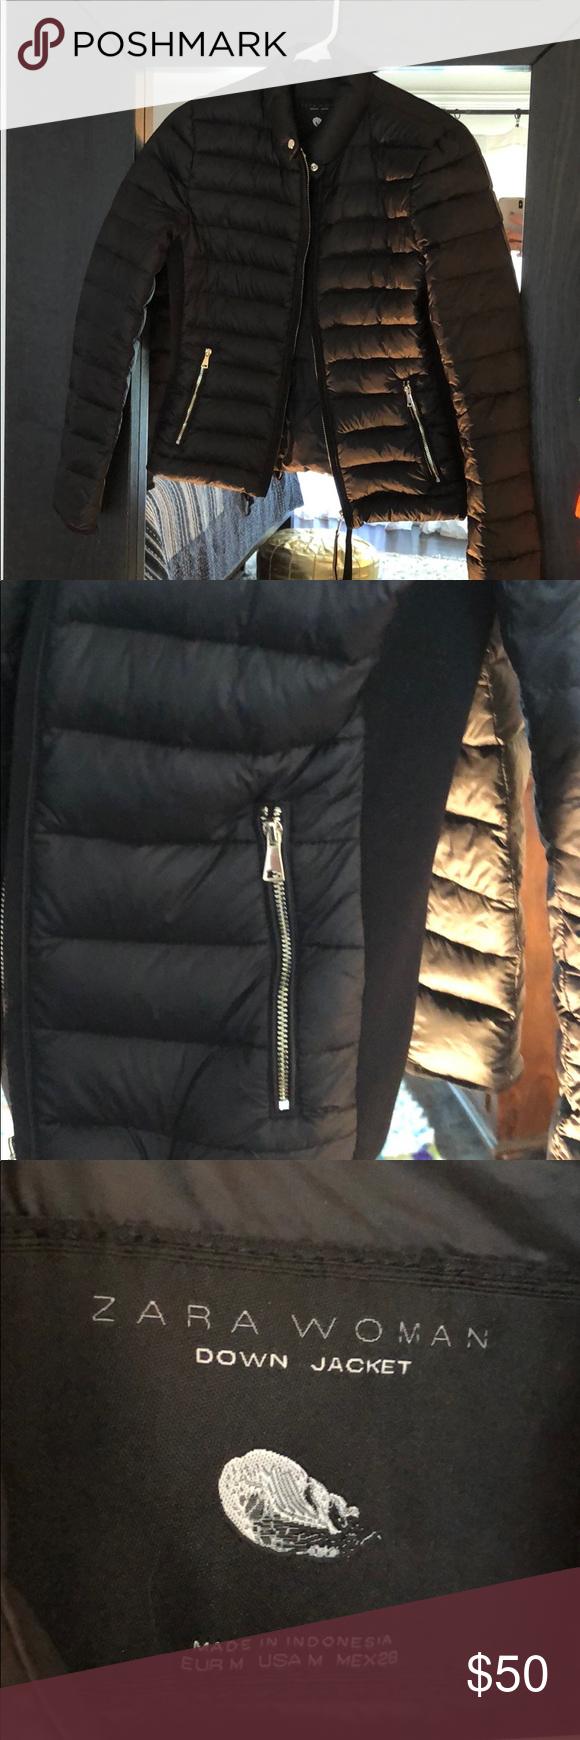 Zara Woman Fitted Down Jacket Zara Women Jackets Zara [ 1740 x 580 Pixel ]